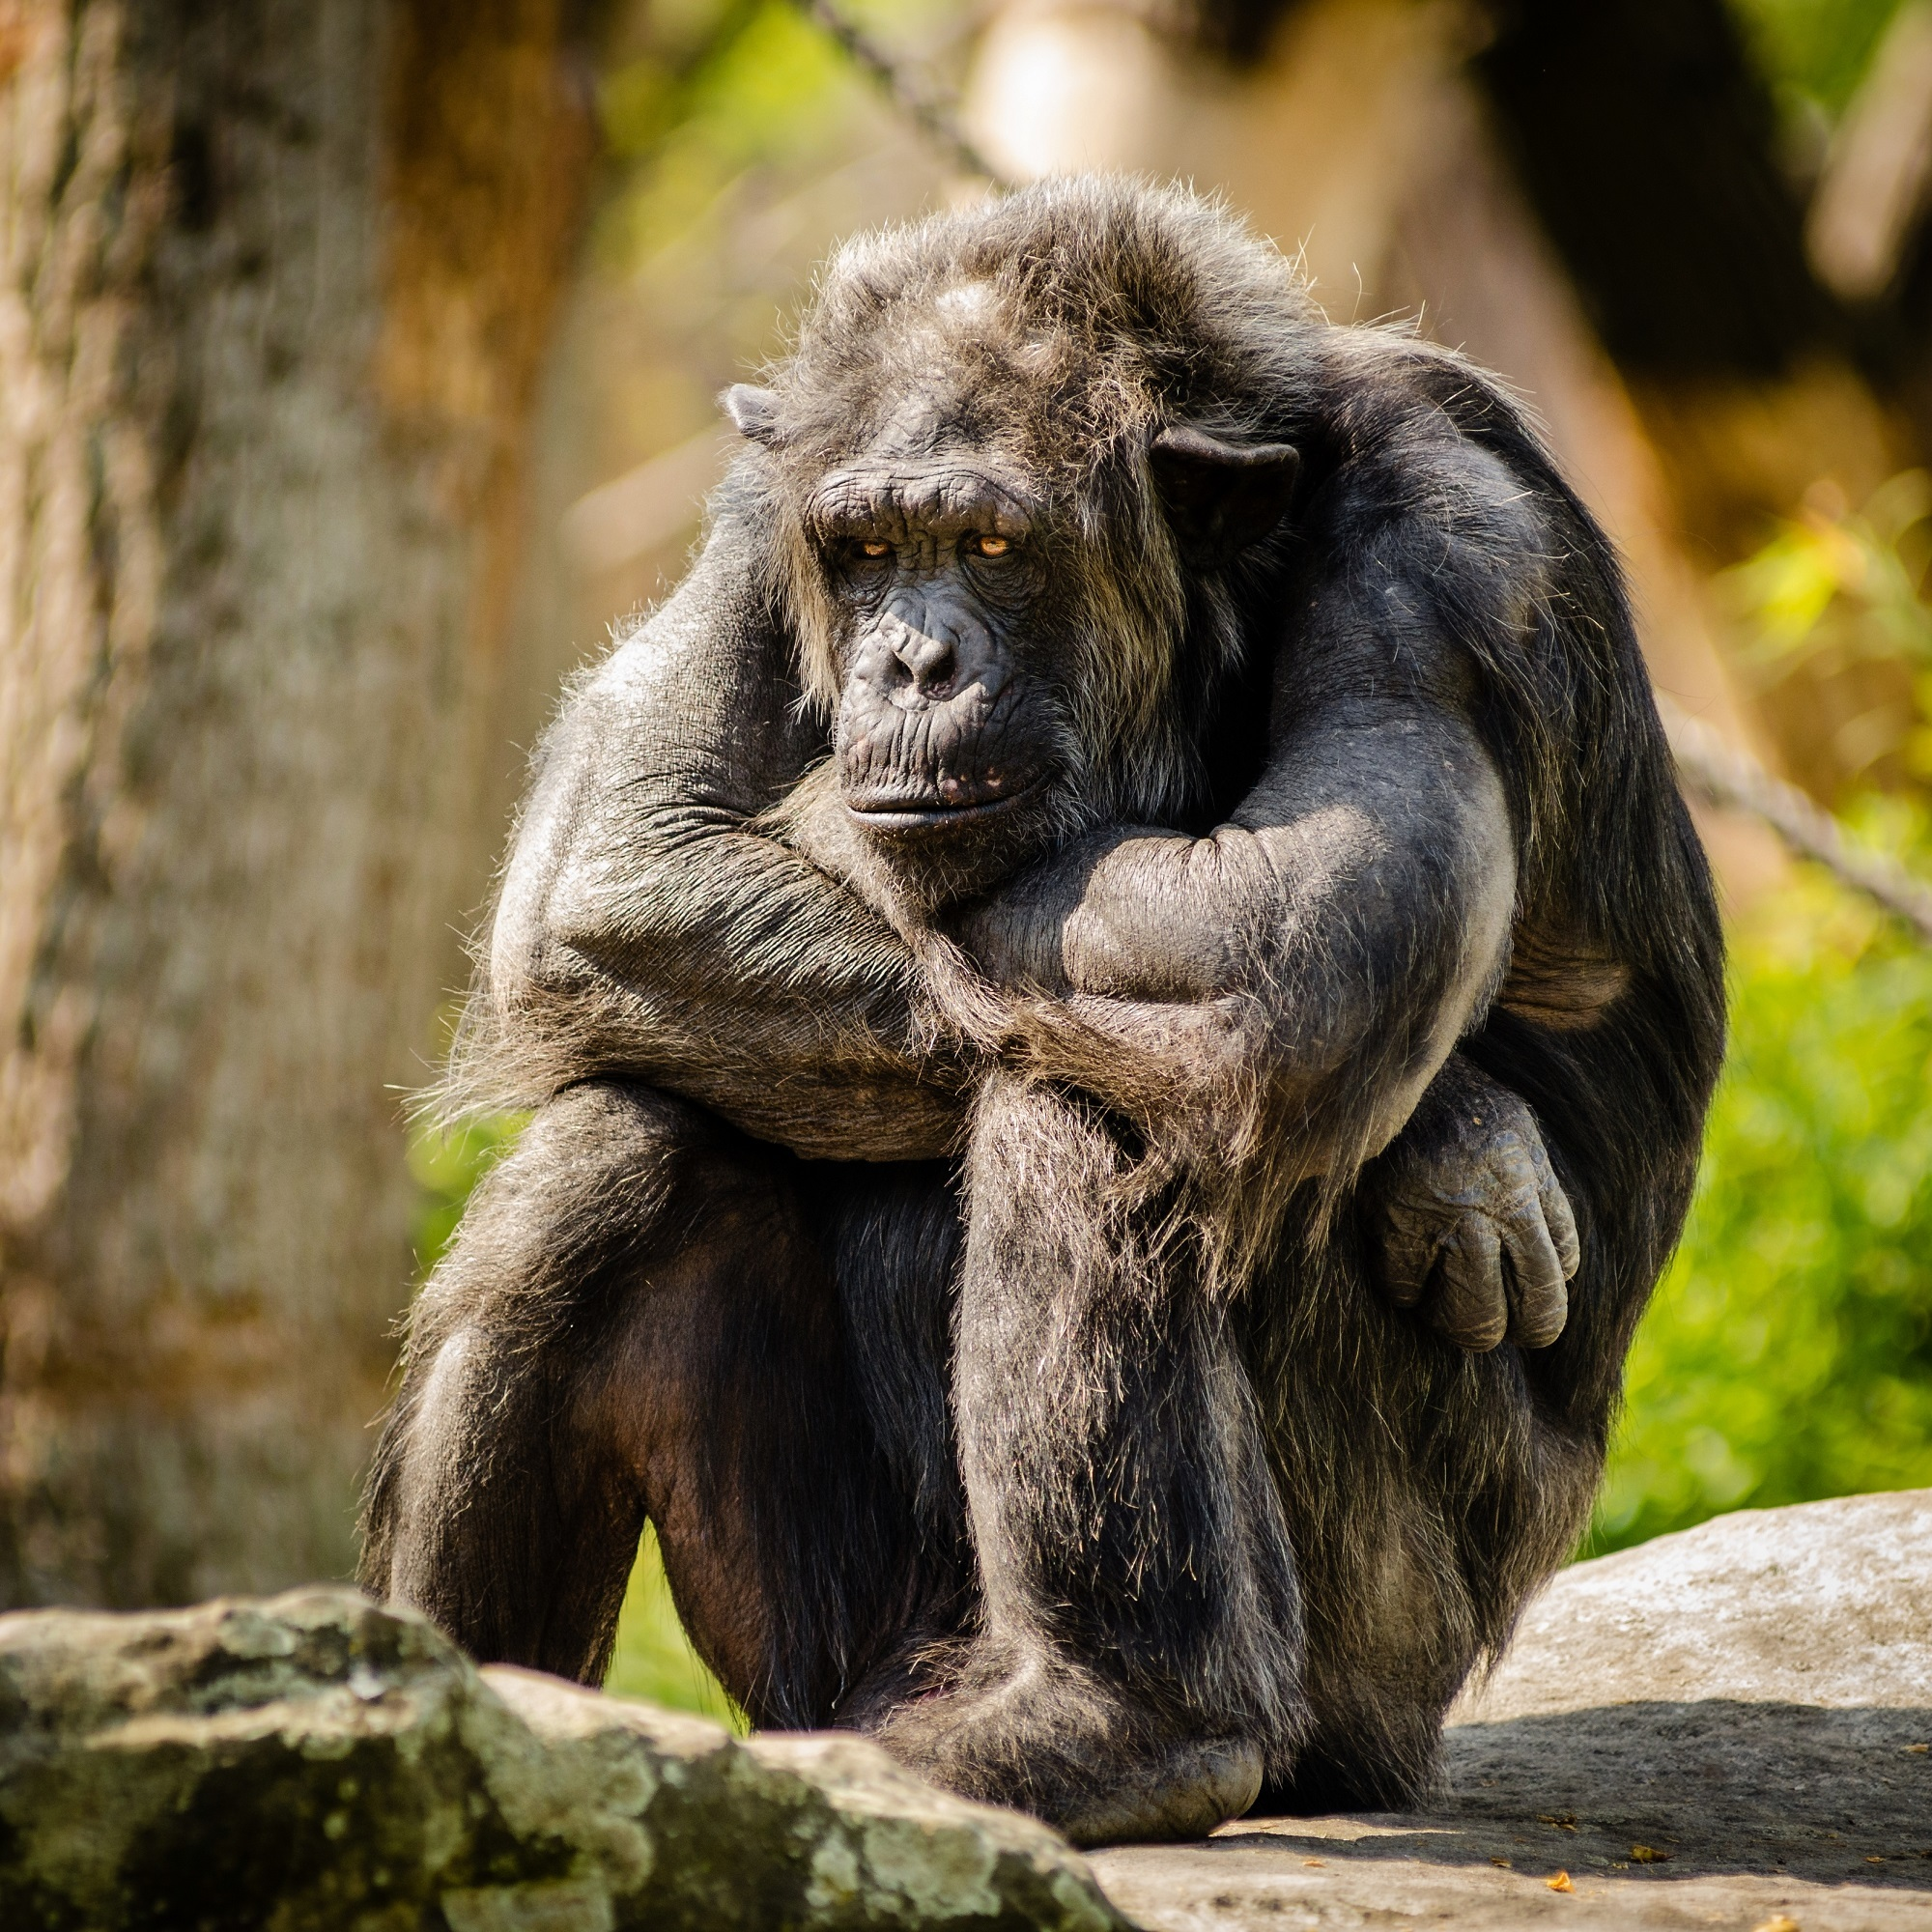 Chimpanzee in the zoo photo